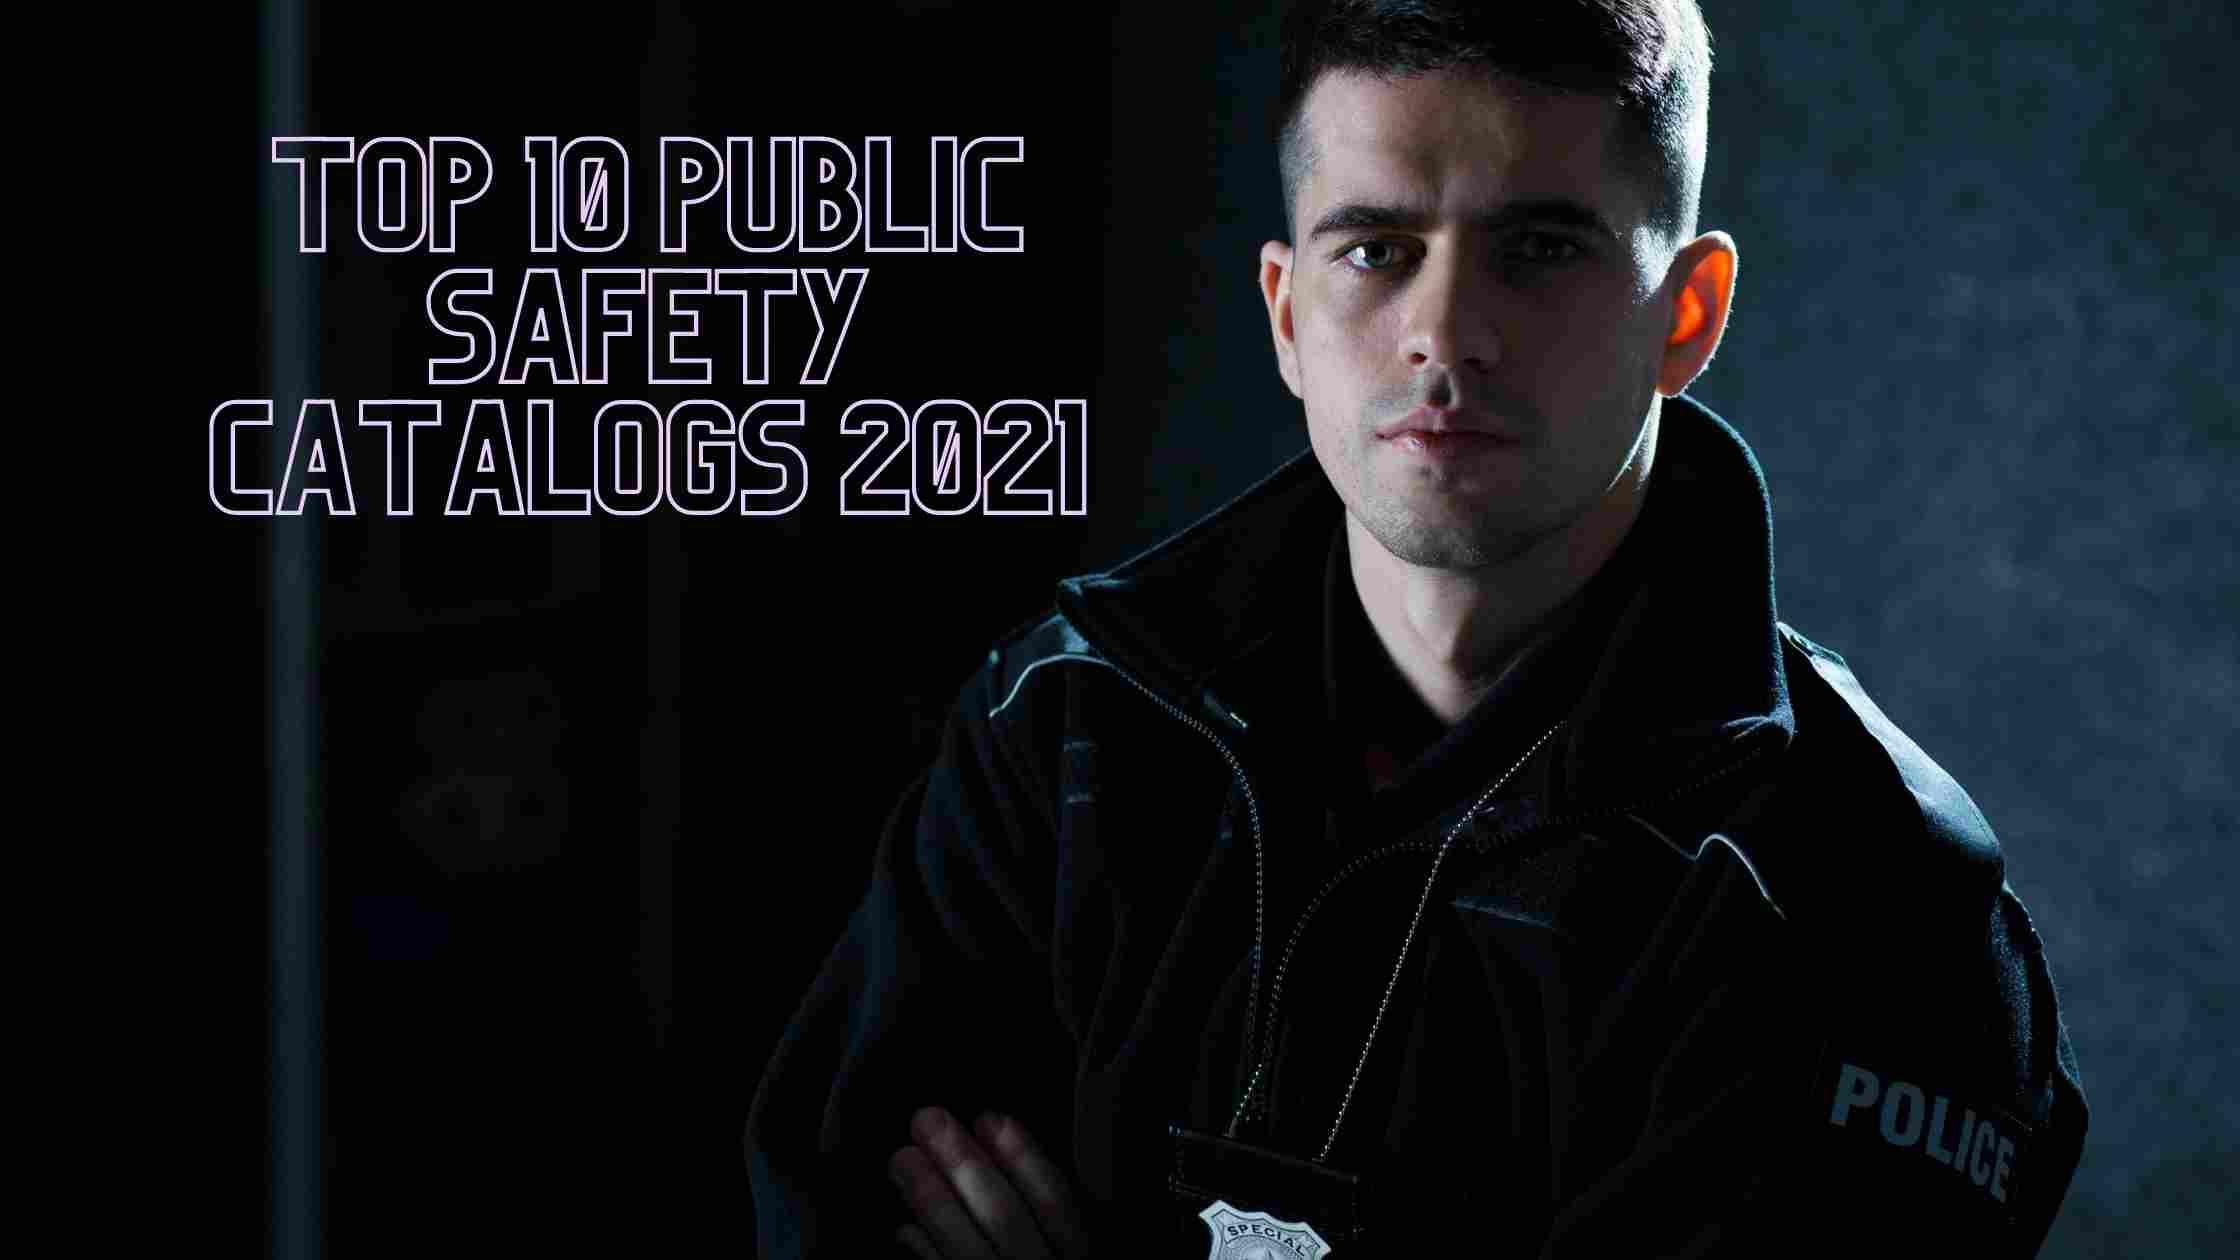 Top 10 public safety catalogs 2021